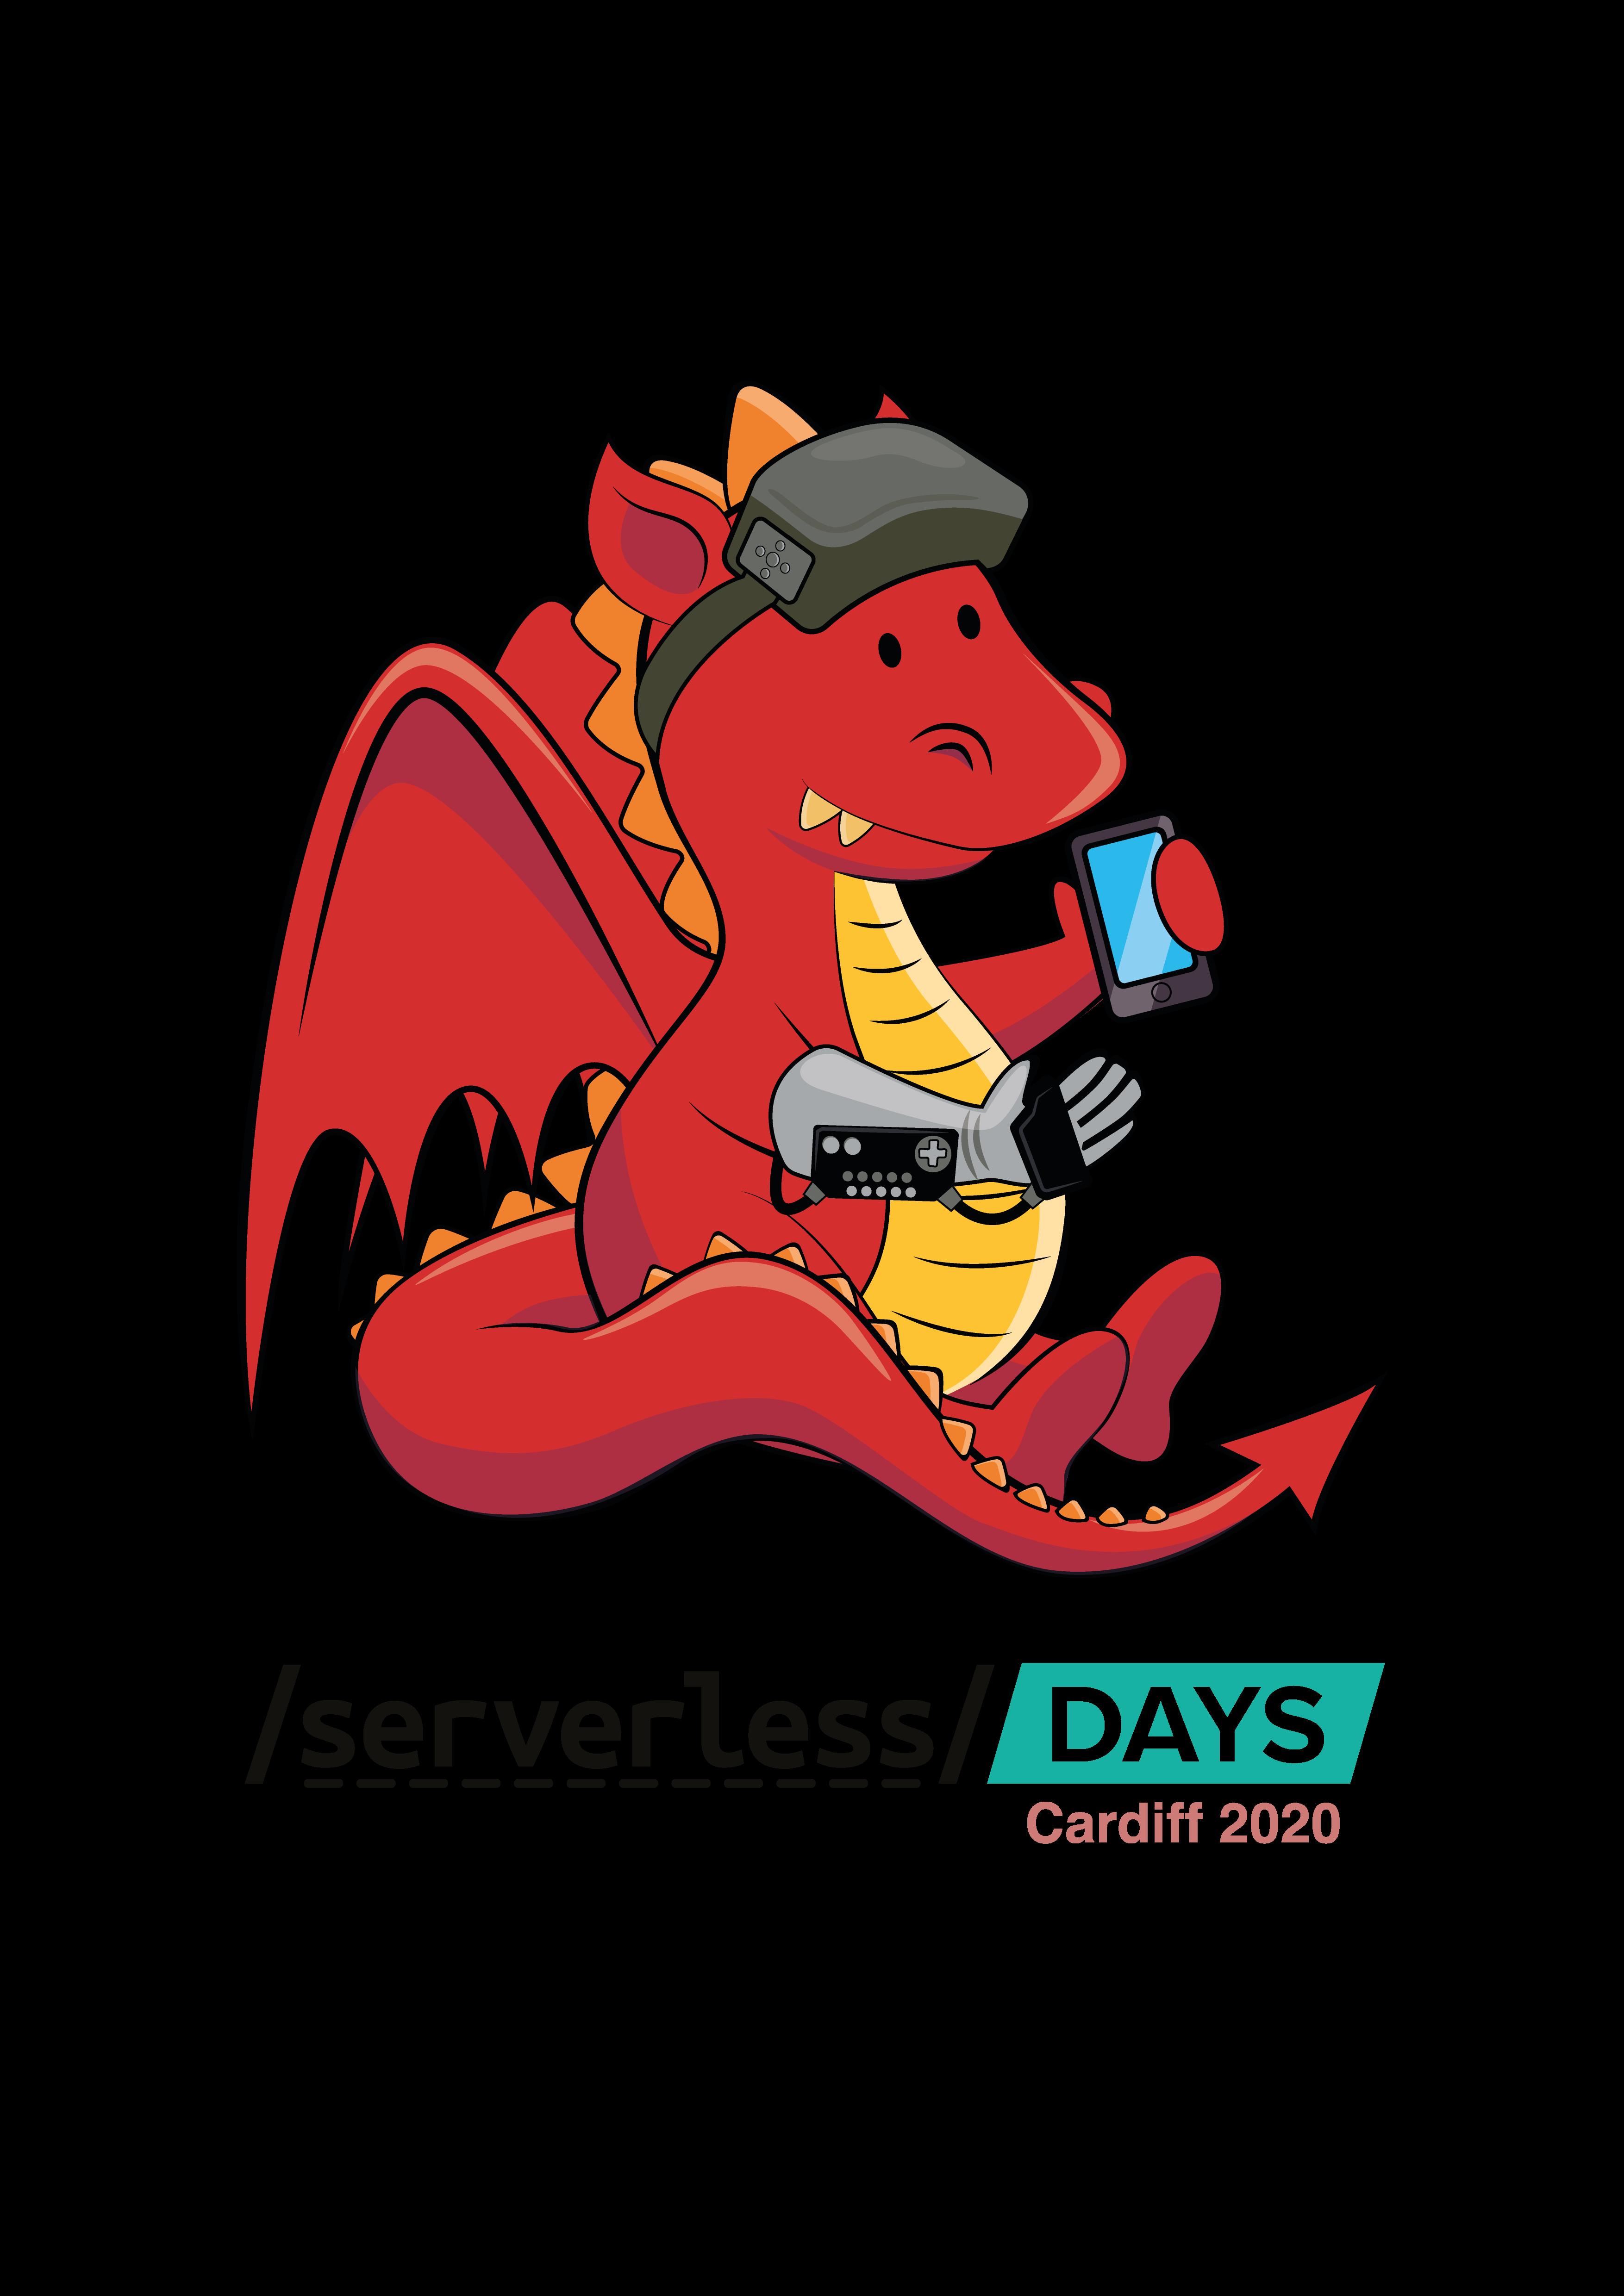 Serverless Days Cardiff 2020, Serverless Days Cardiff 2020